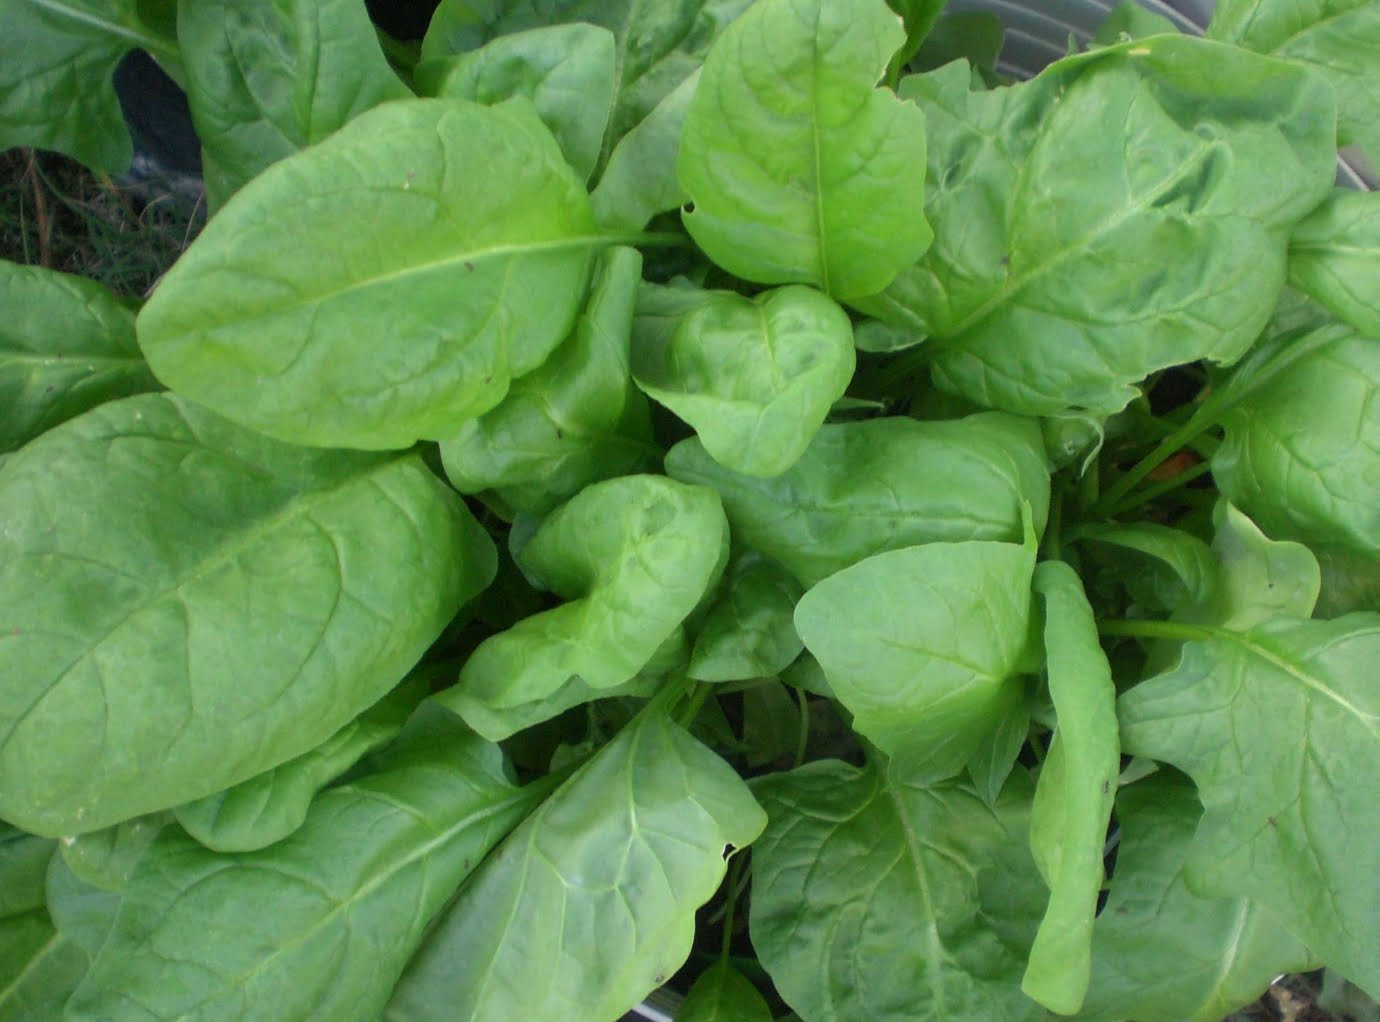 A Kitchen Garden in Kihei Maui: Growing Spinach in Kihei